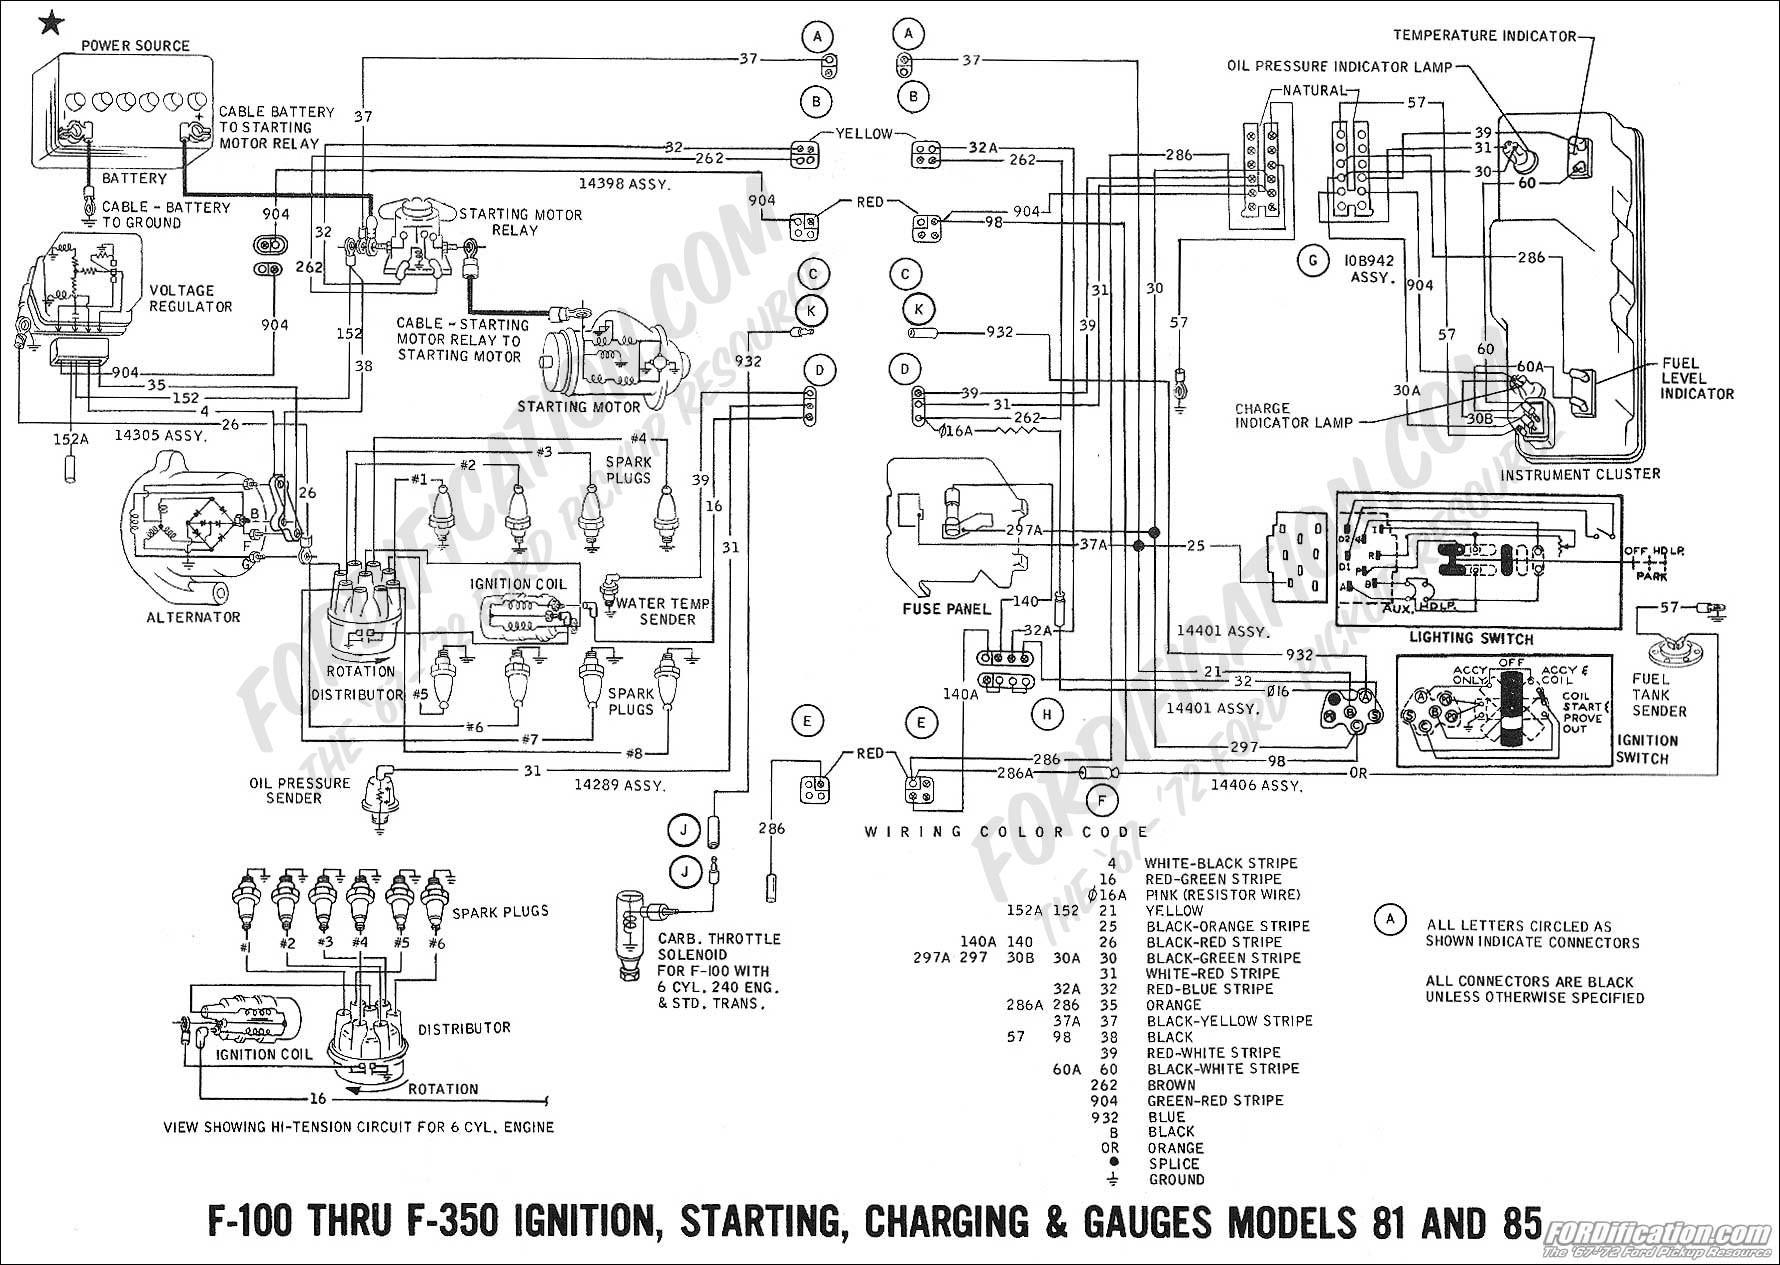 hight resolution of 2001 saturn sl1 engine diagram iwak kutok saturn sl1 engine diagram wiring info of 2001